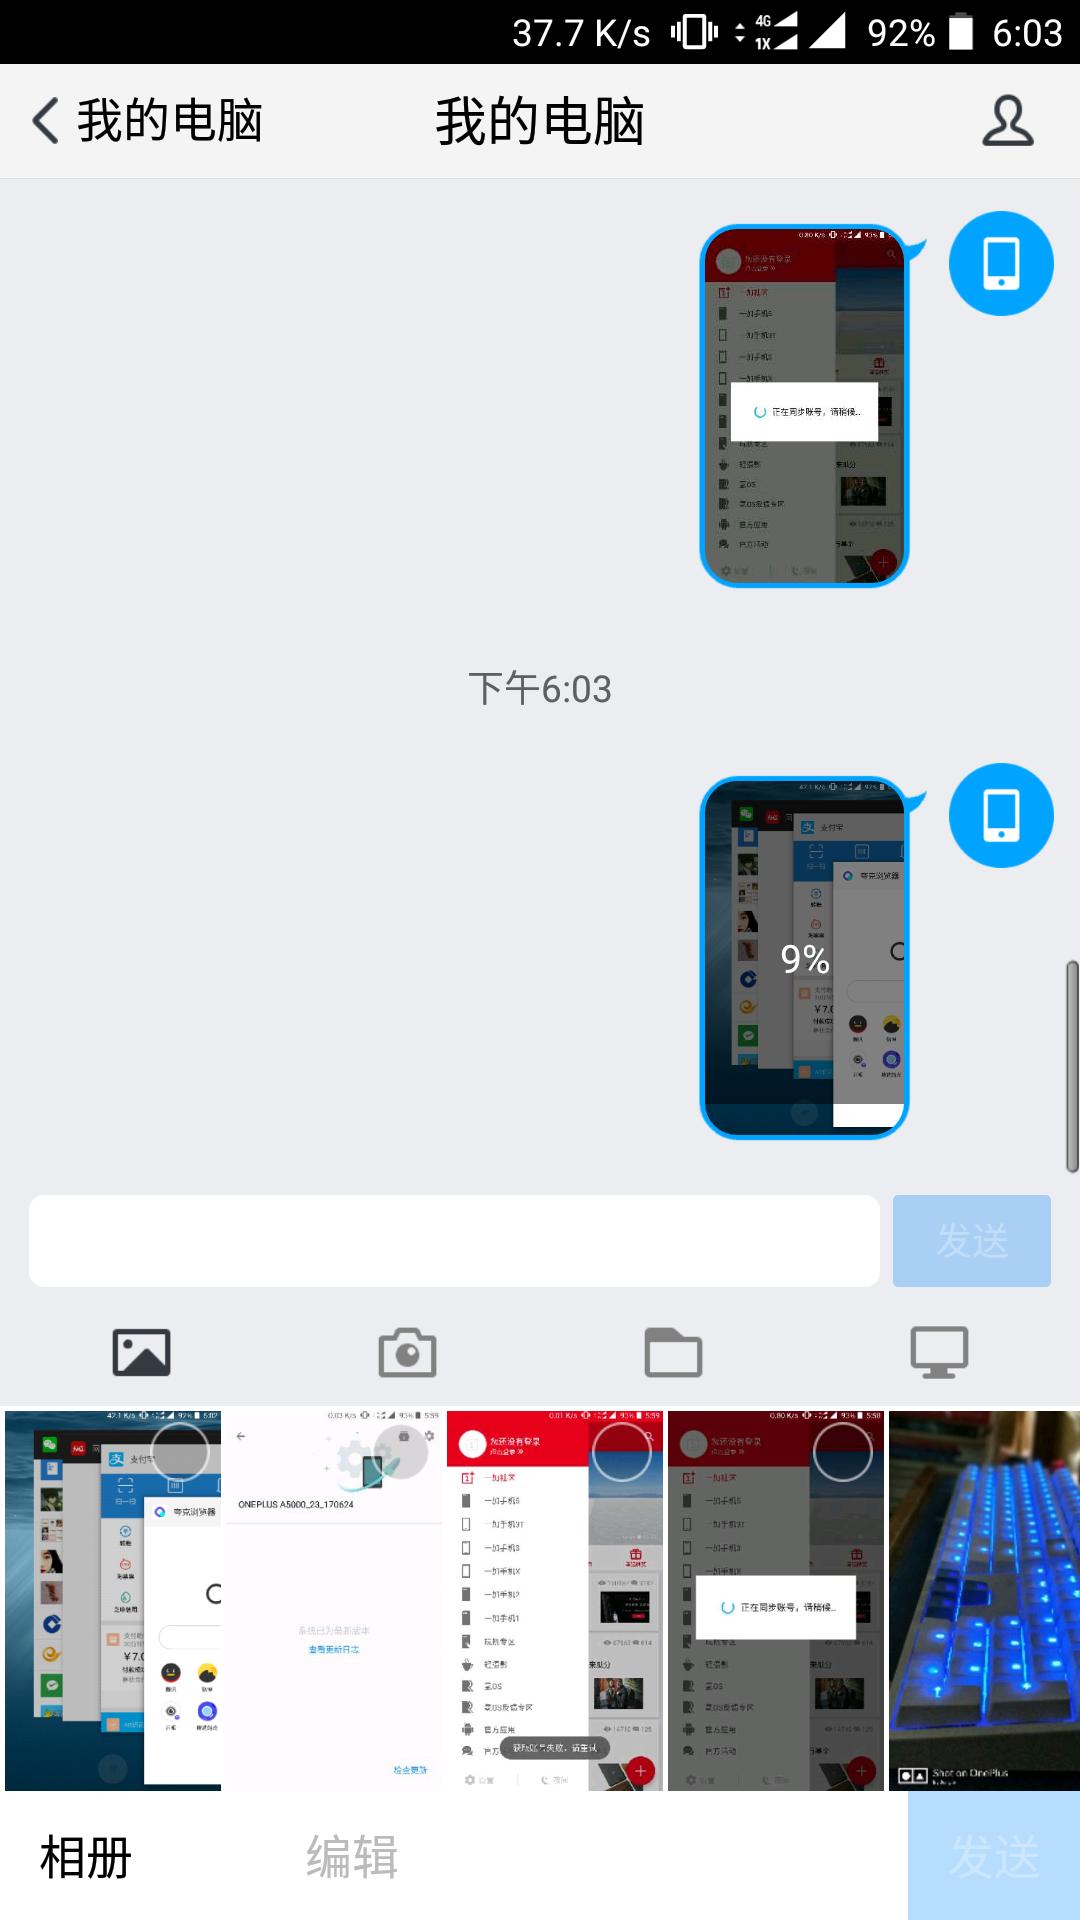 Screenshot_20170627-180354.png